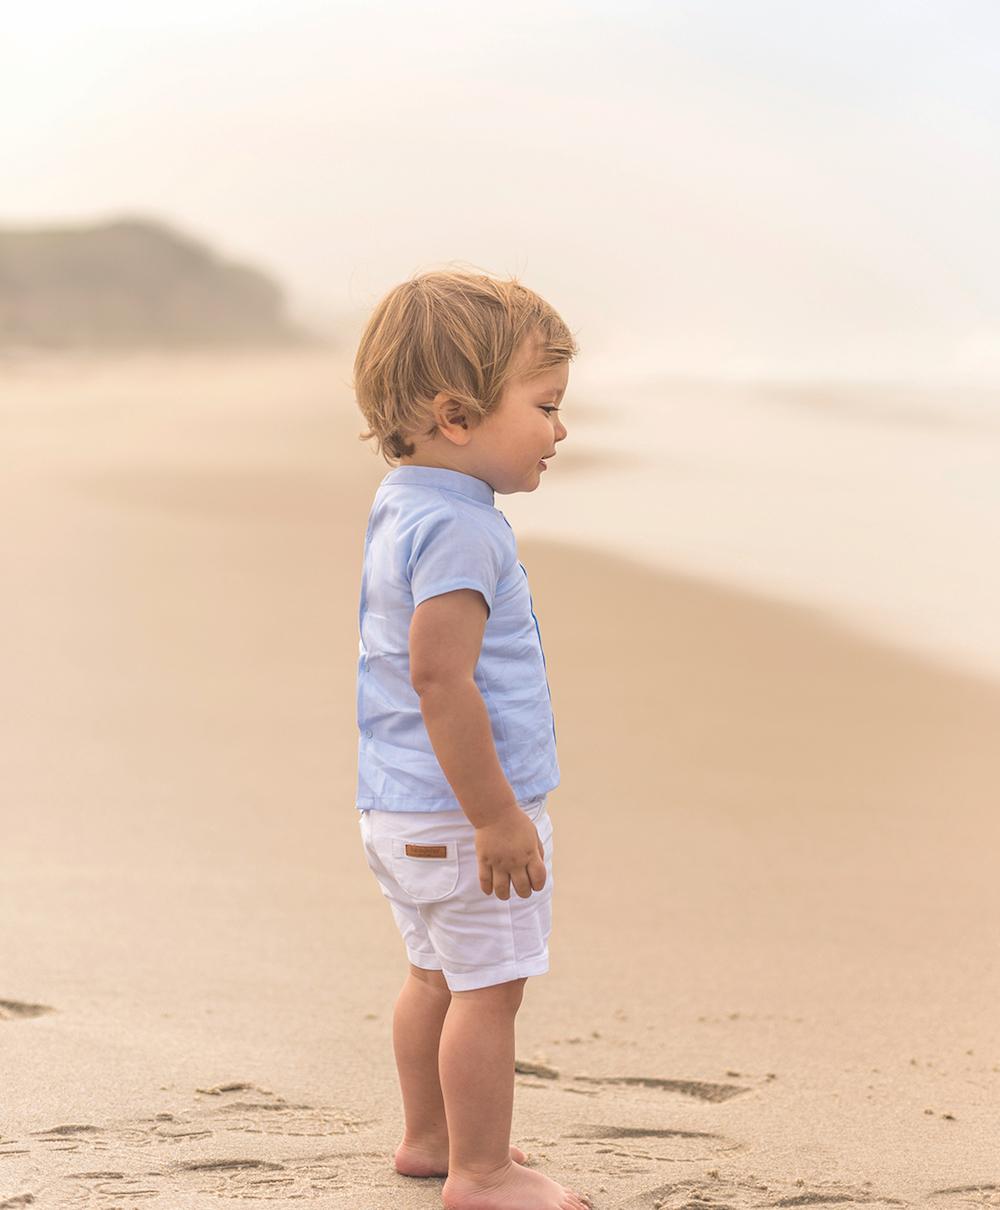 Laranjinha moda infantil SS18, ropa sencilla y de calidad